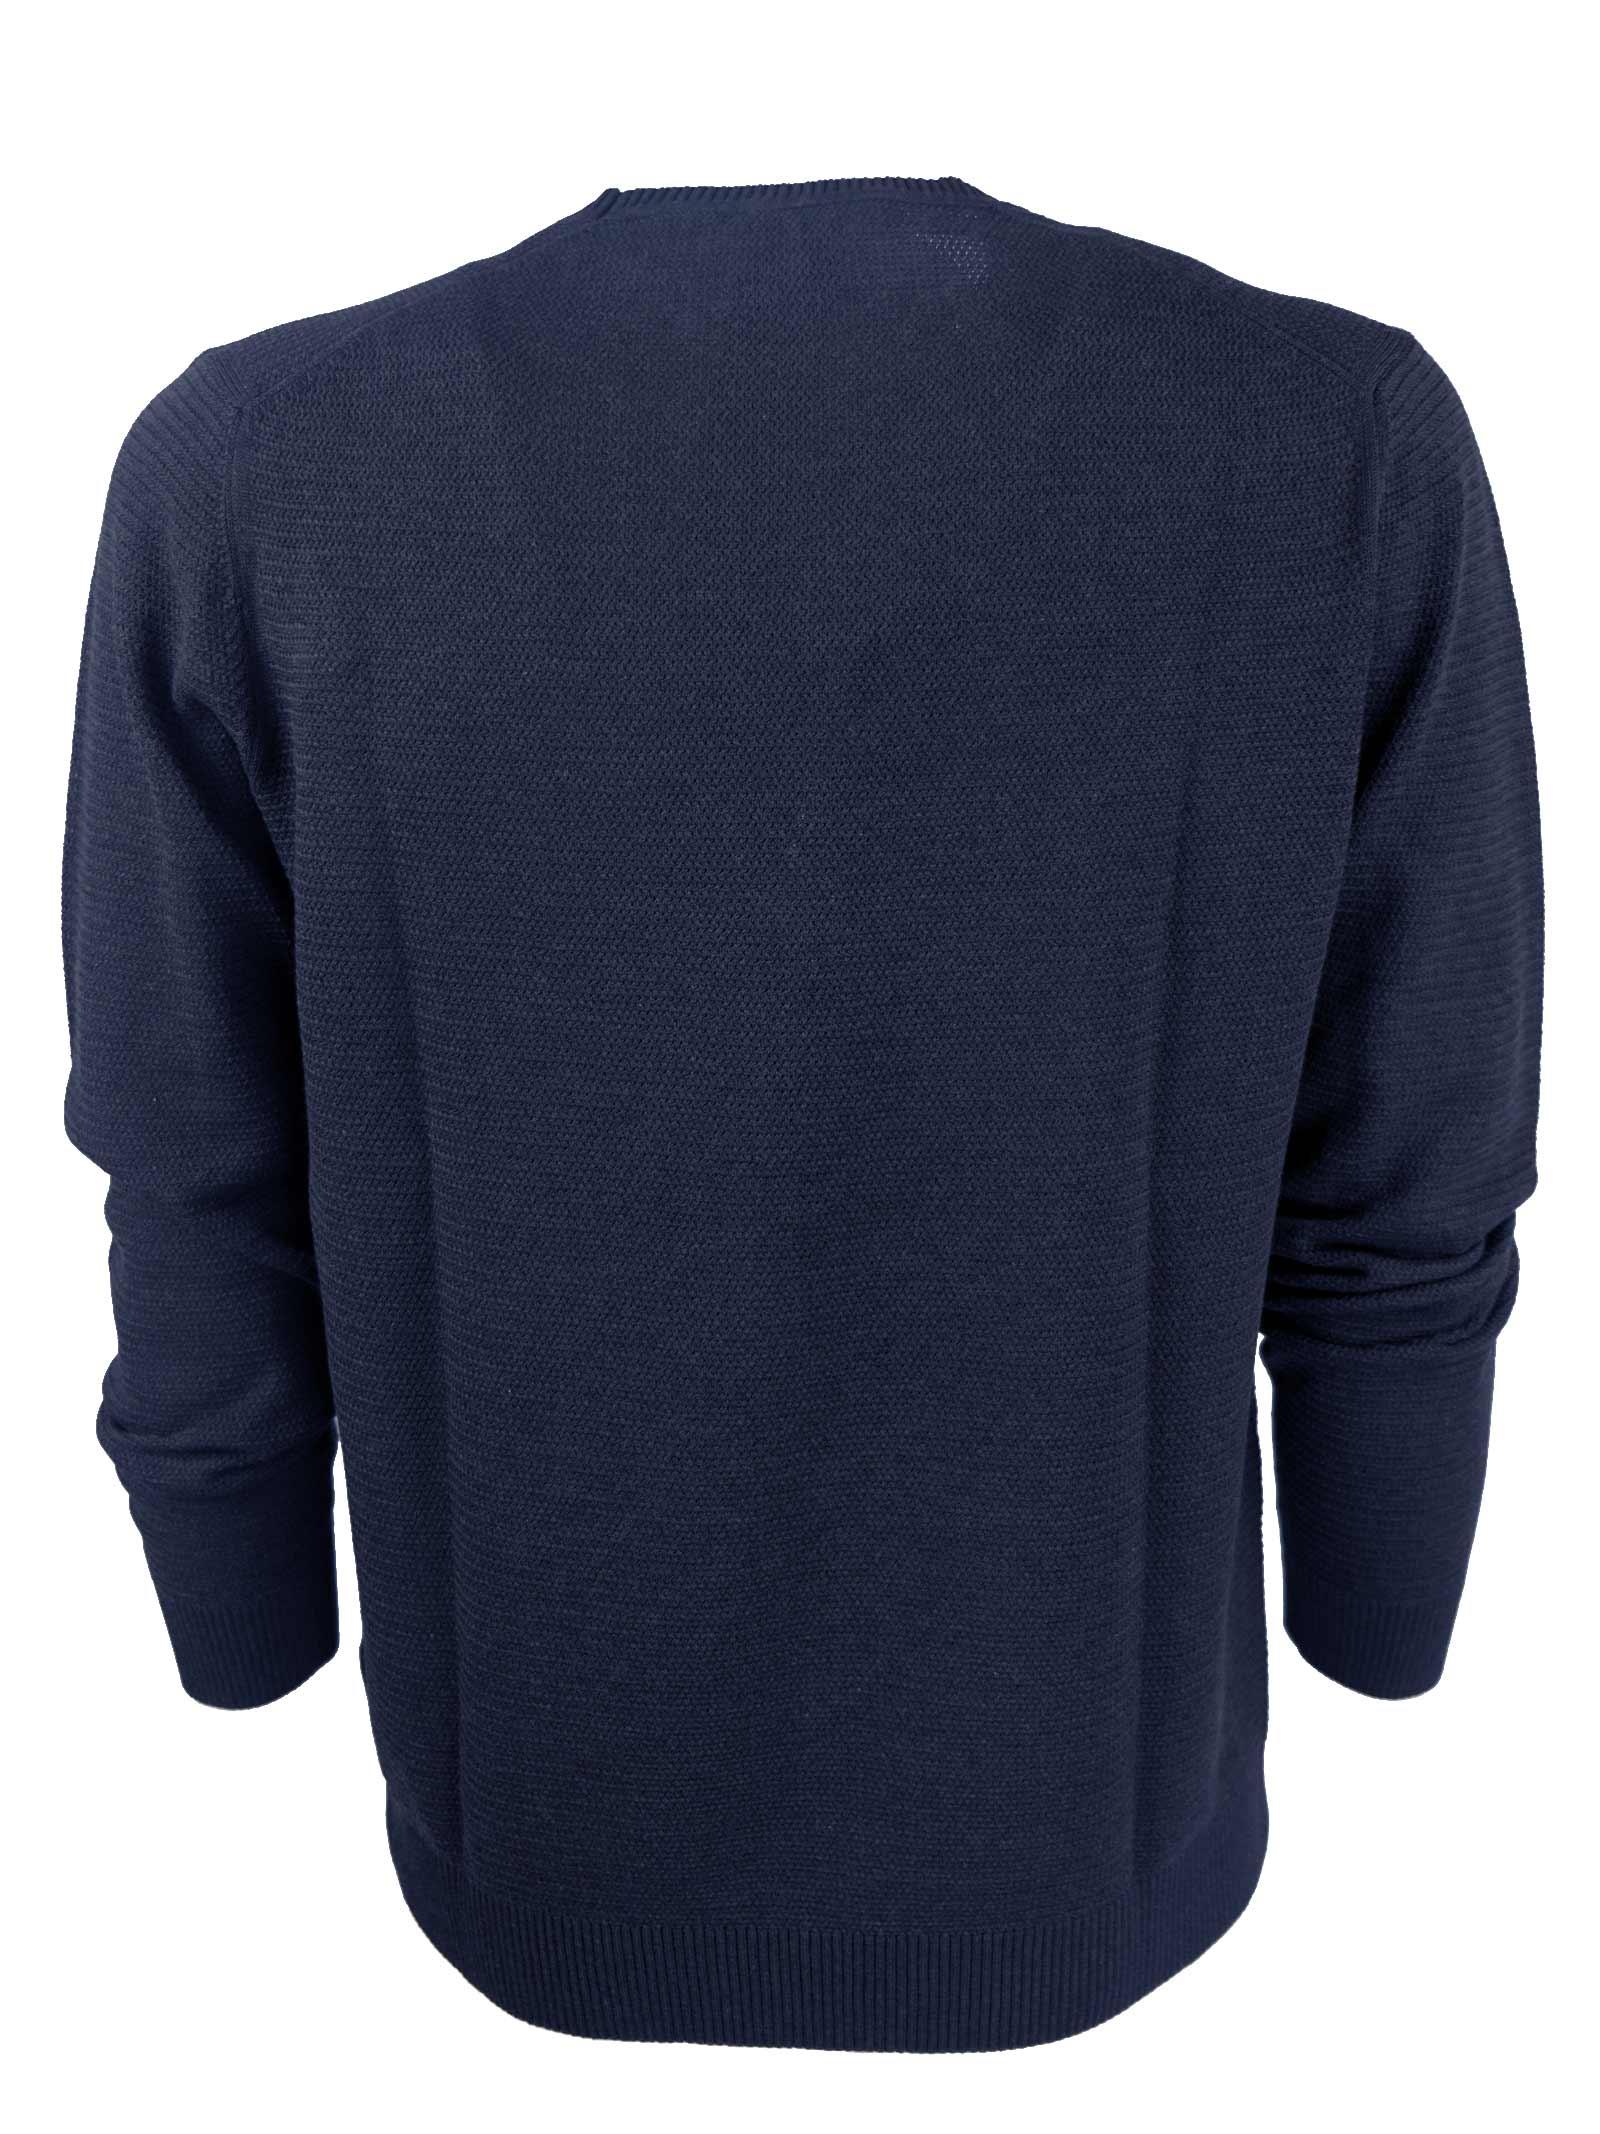 Basket stitch sweater H953 | Knitwear | 3200NR90